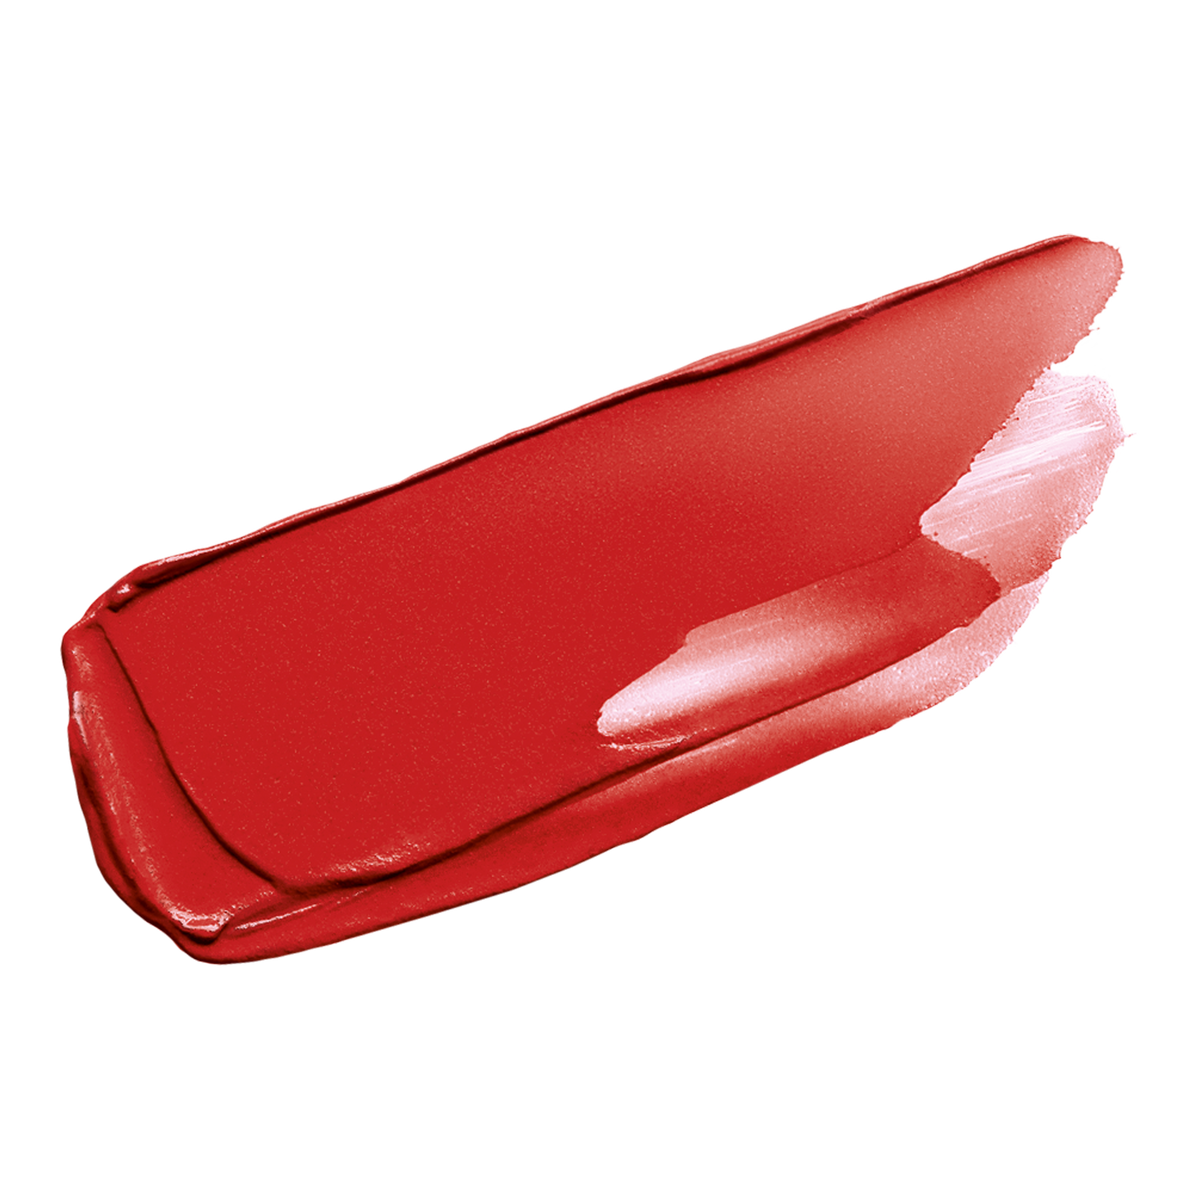 Le Rouge Luminous Matte Hydrating Lipstick